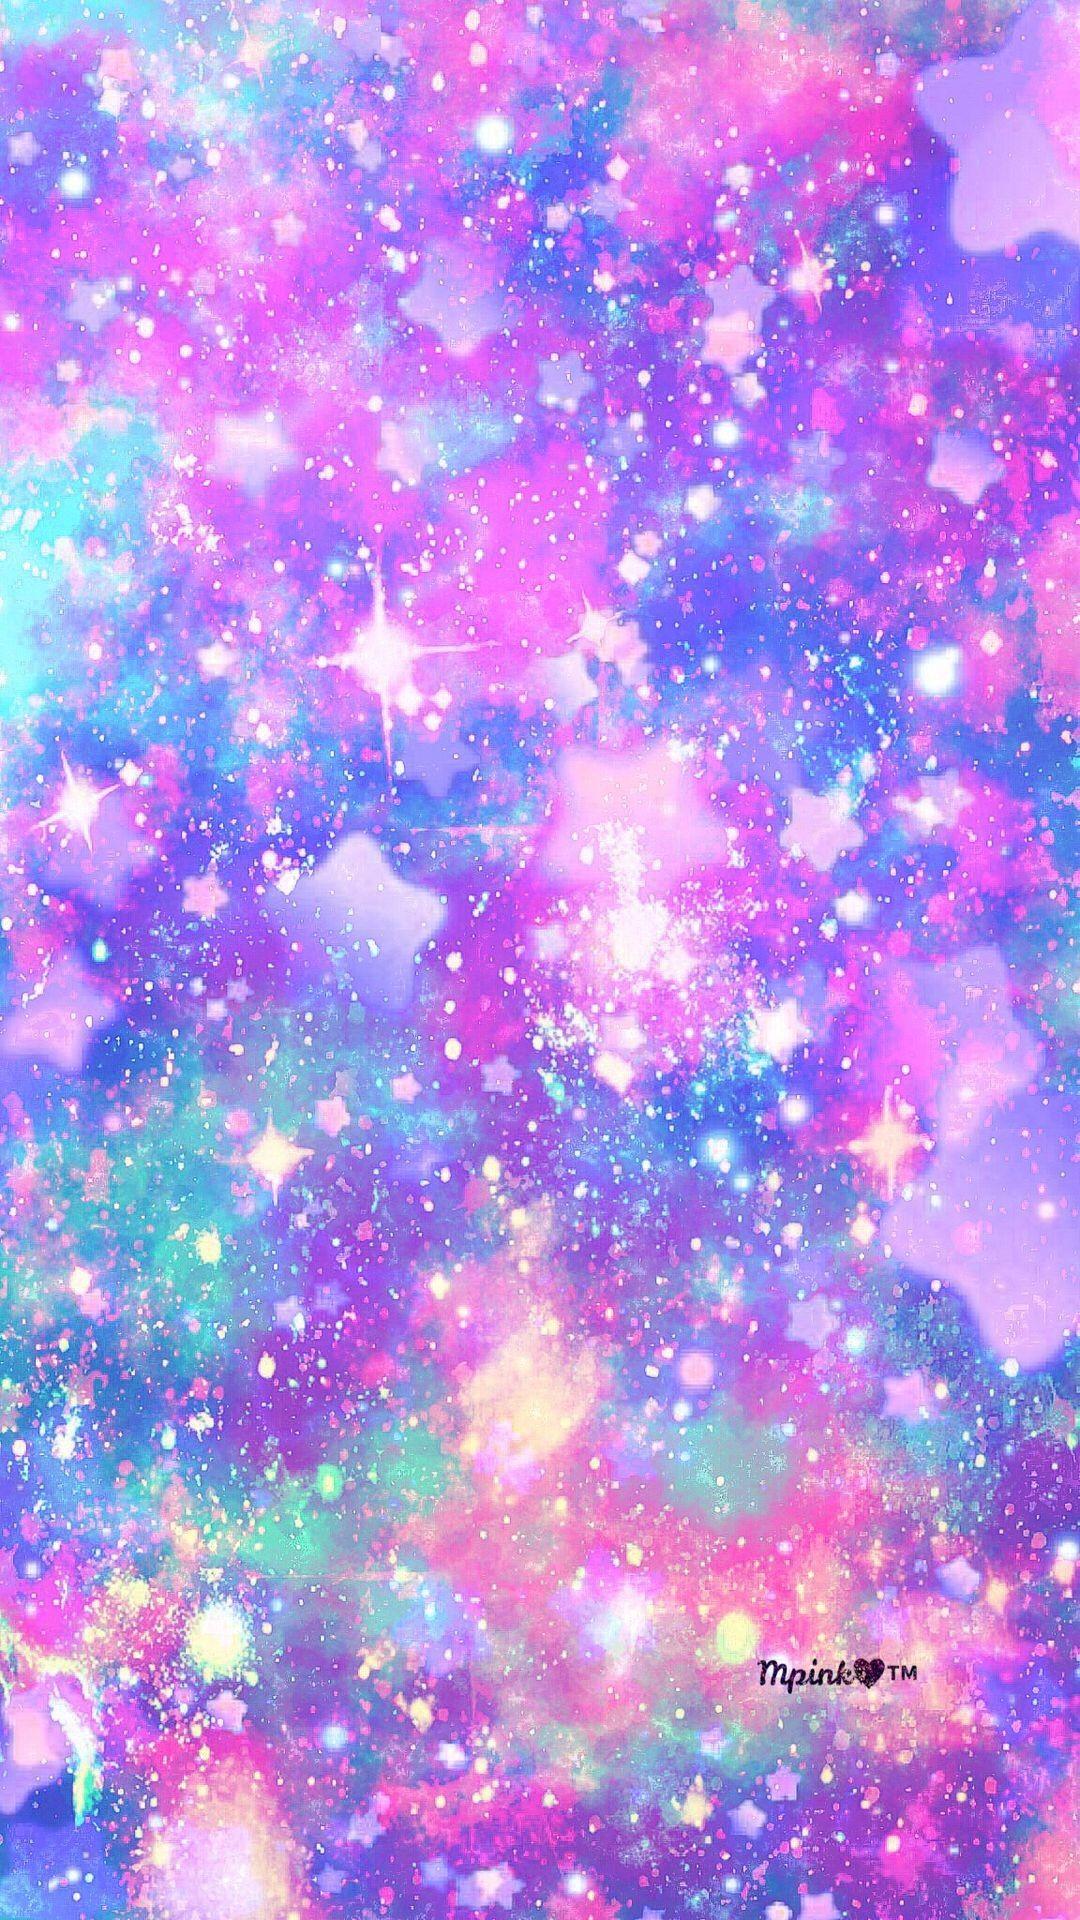 Purple Galaxy Glitter Wallpapers On Wallpaperdog